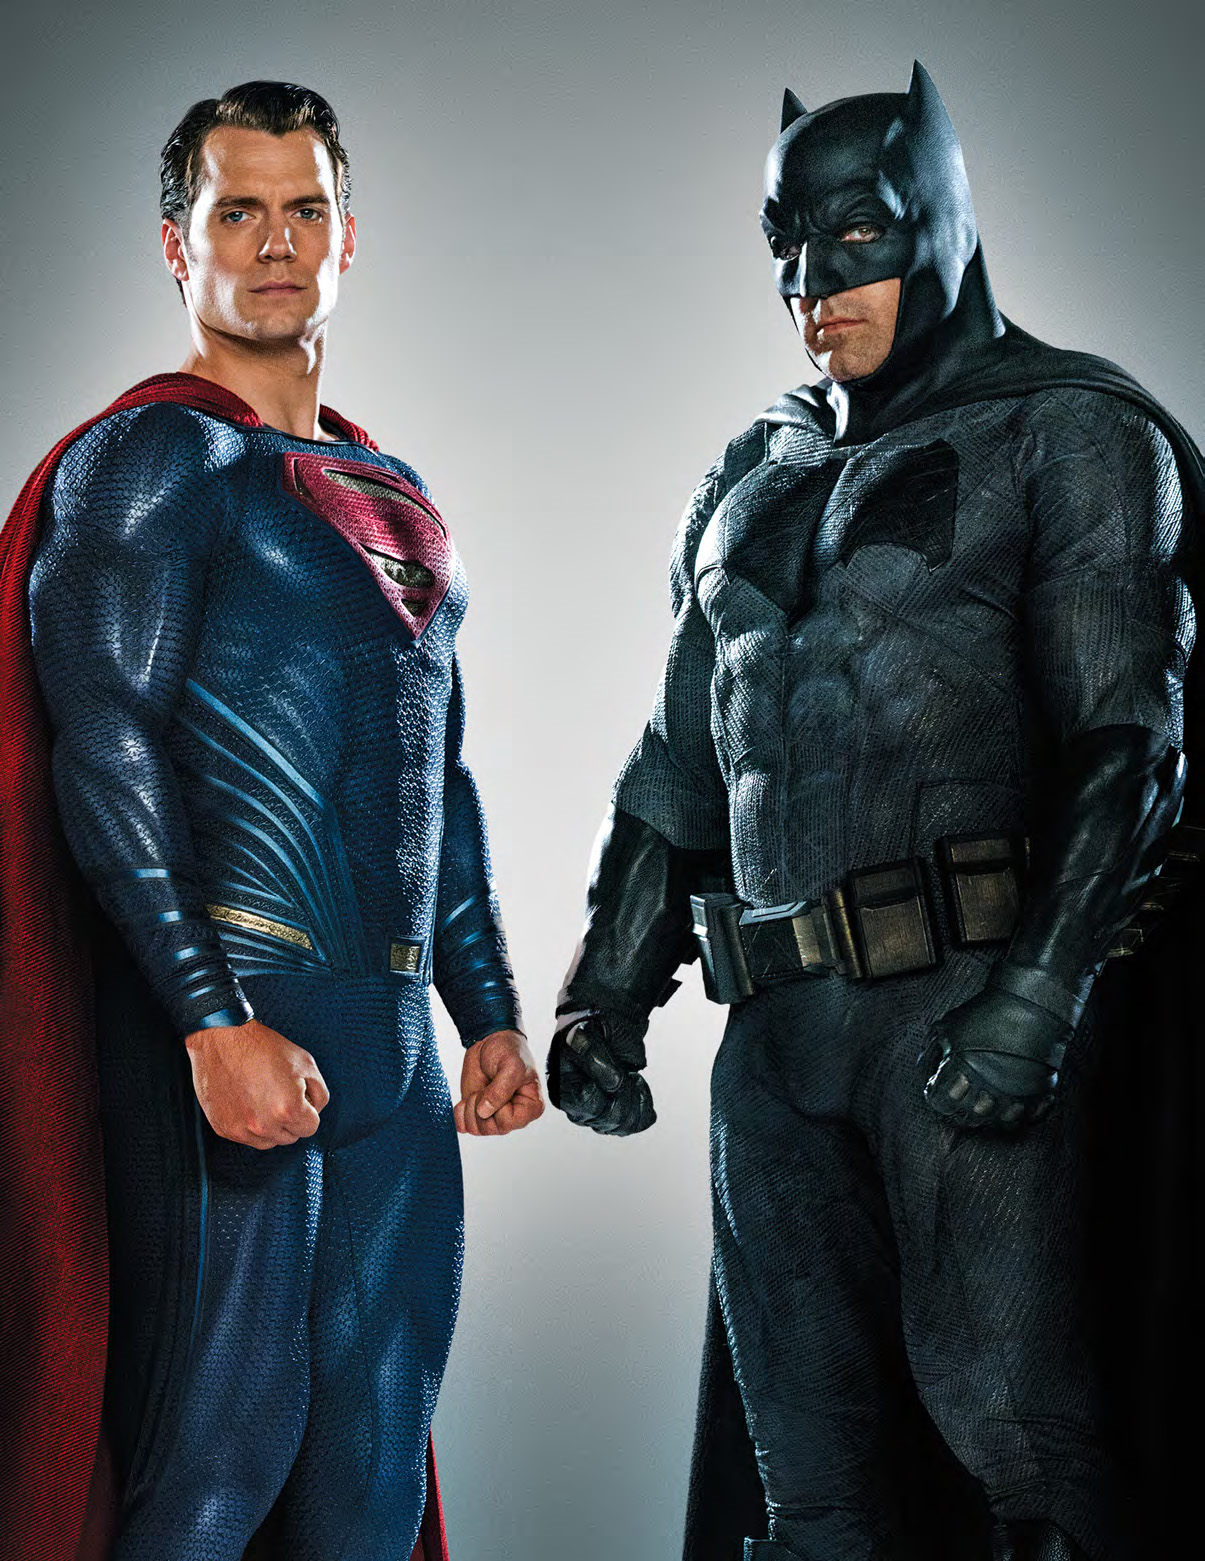 DC宇宙元老級的他終於續約!未來至少可以在三部電影中看到他的身影!- 我們用電影寫日記